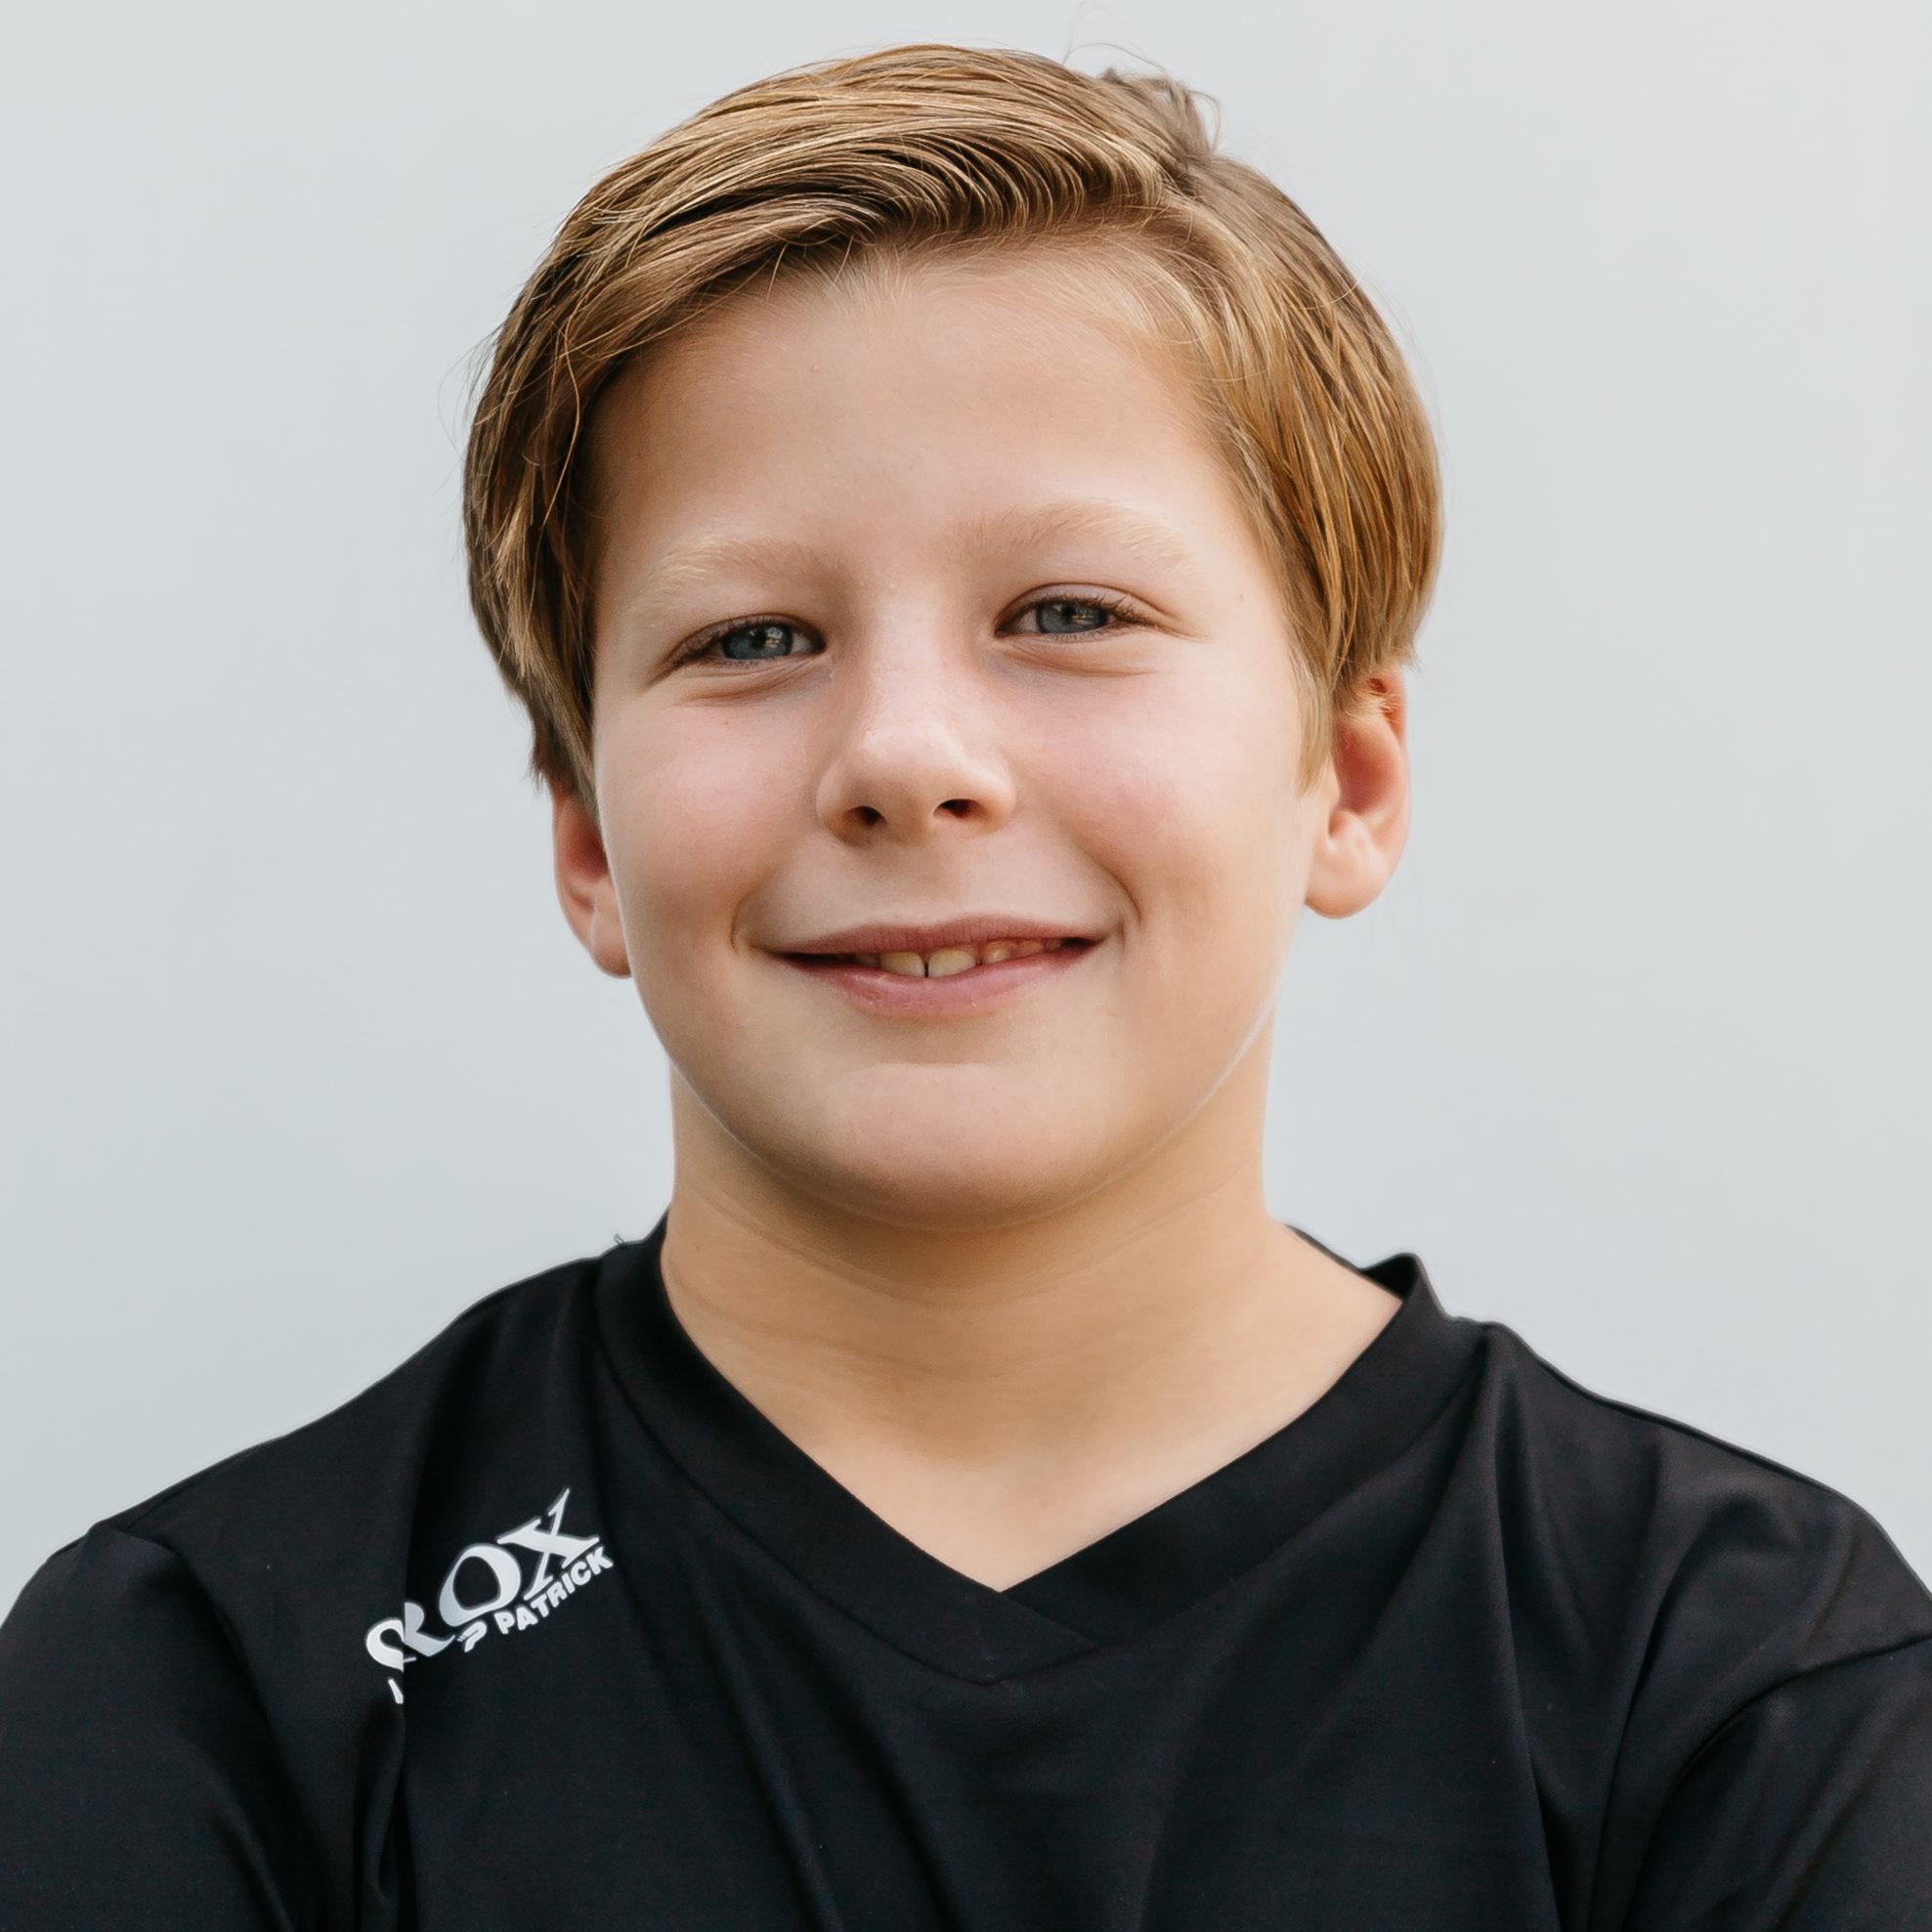 https://socceracademybreda.nl/wp-content/uploads/2017/05/SAB-Lode-1-e1568185687596.jpg